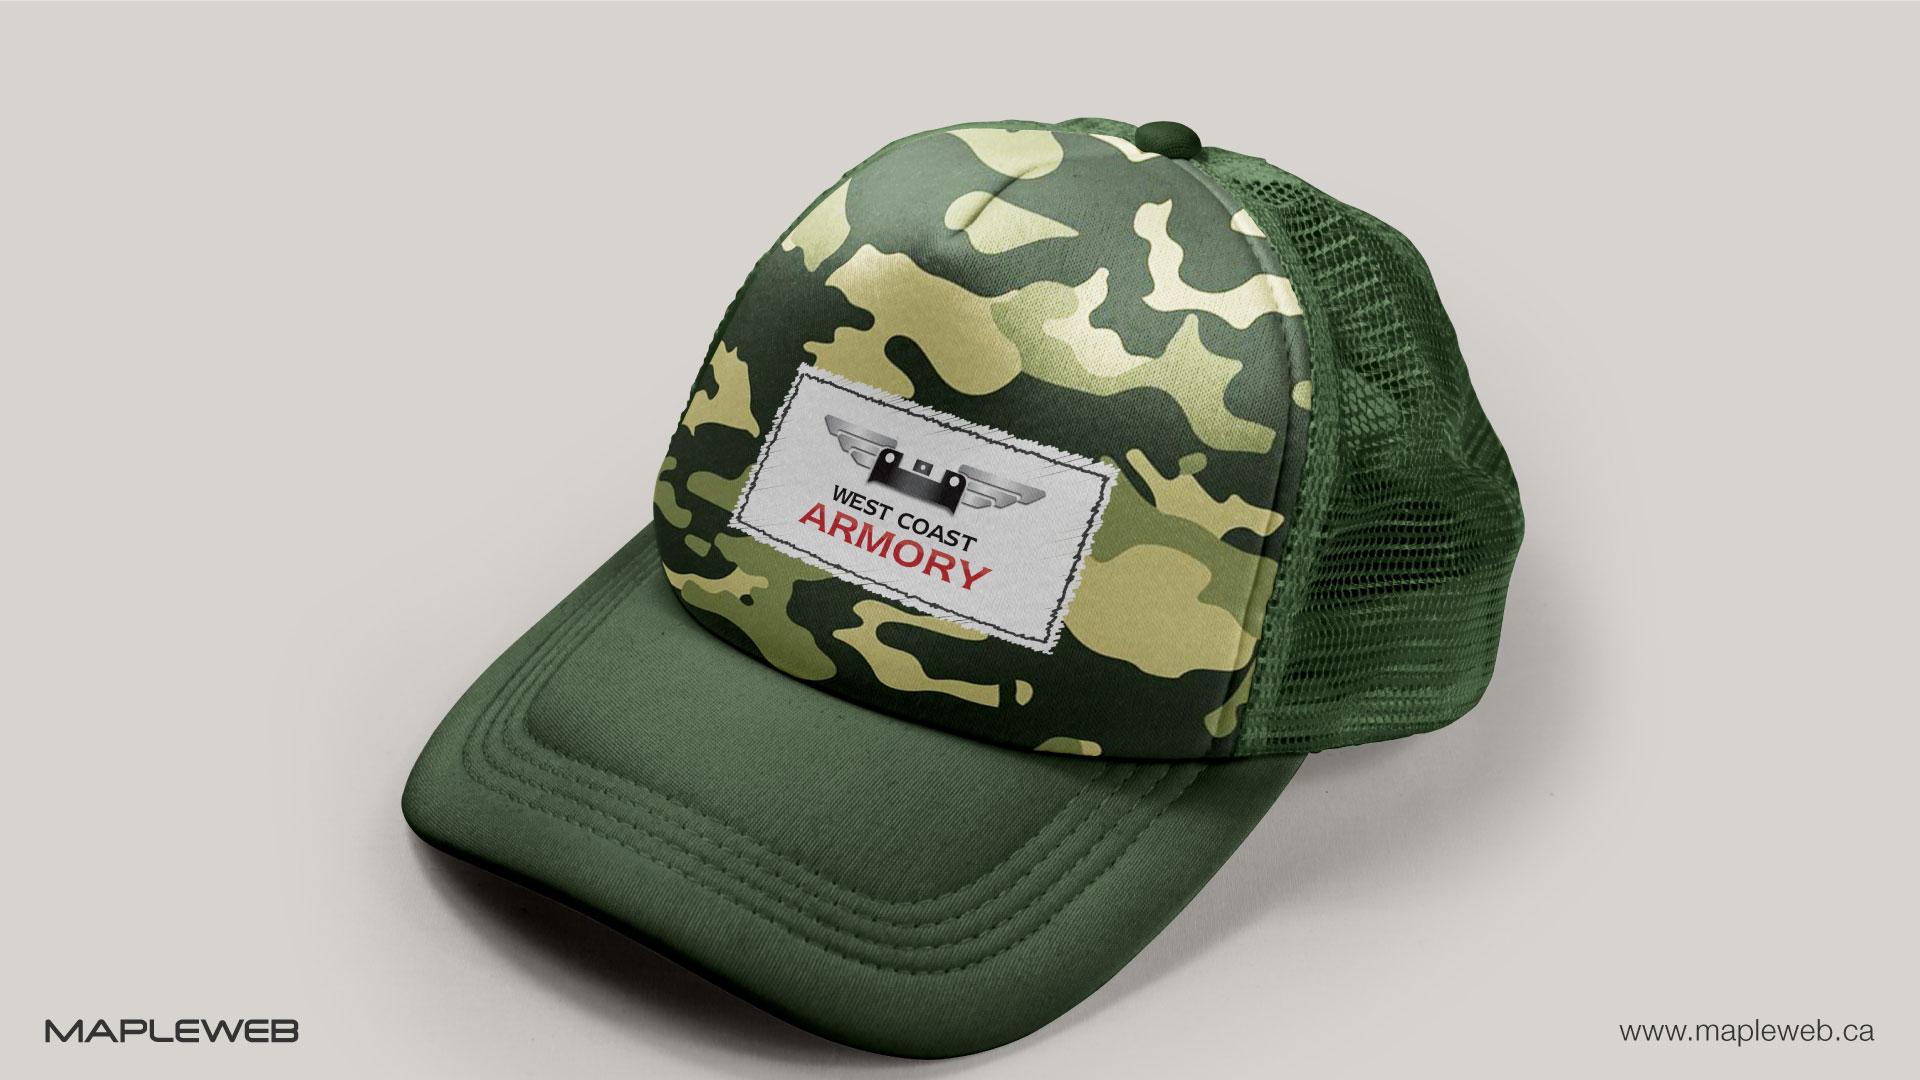 west-coast-armory-brand-logo-design-by-mapleweb-vancouver-canada-cap-mock